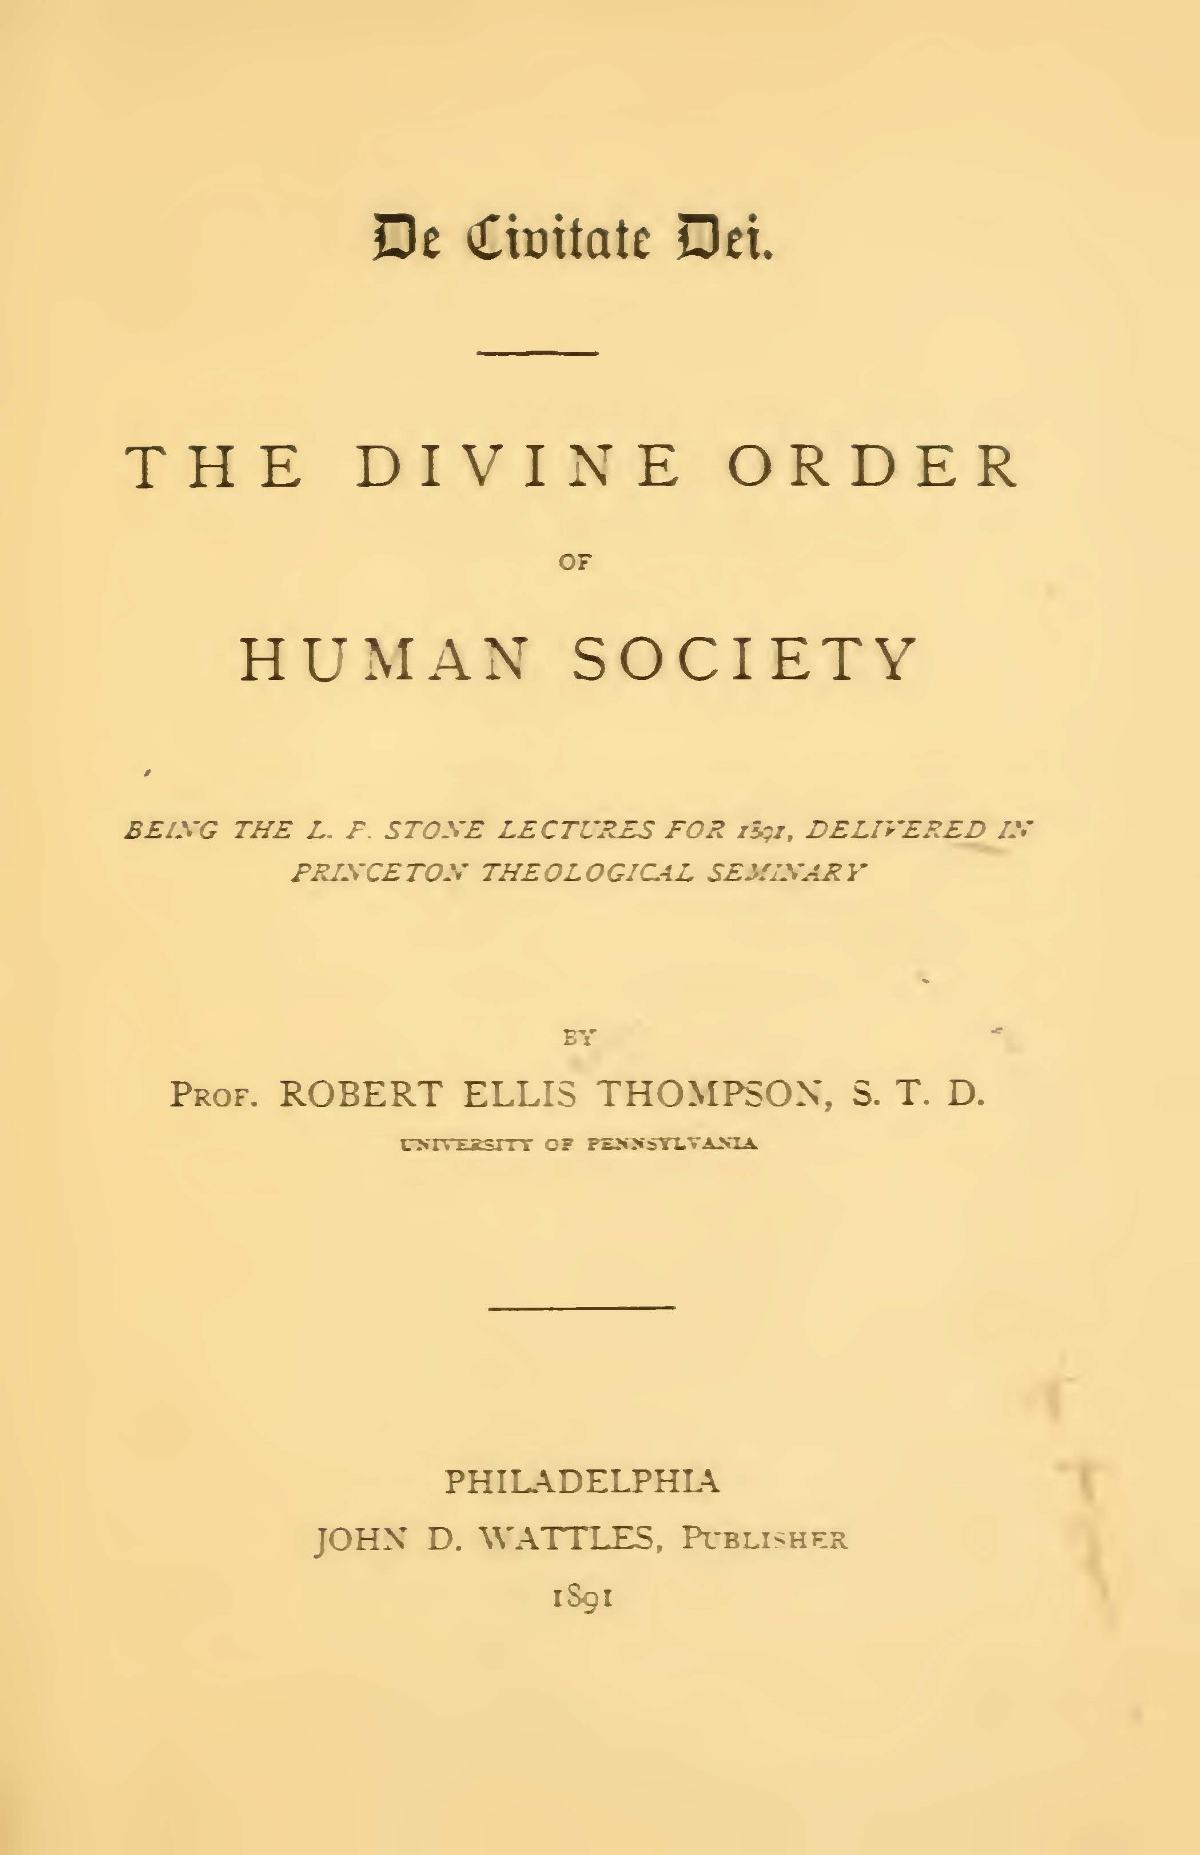 Thompson, Robert Ellis, The Divine Order of Human Society Title Page.jpg